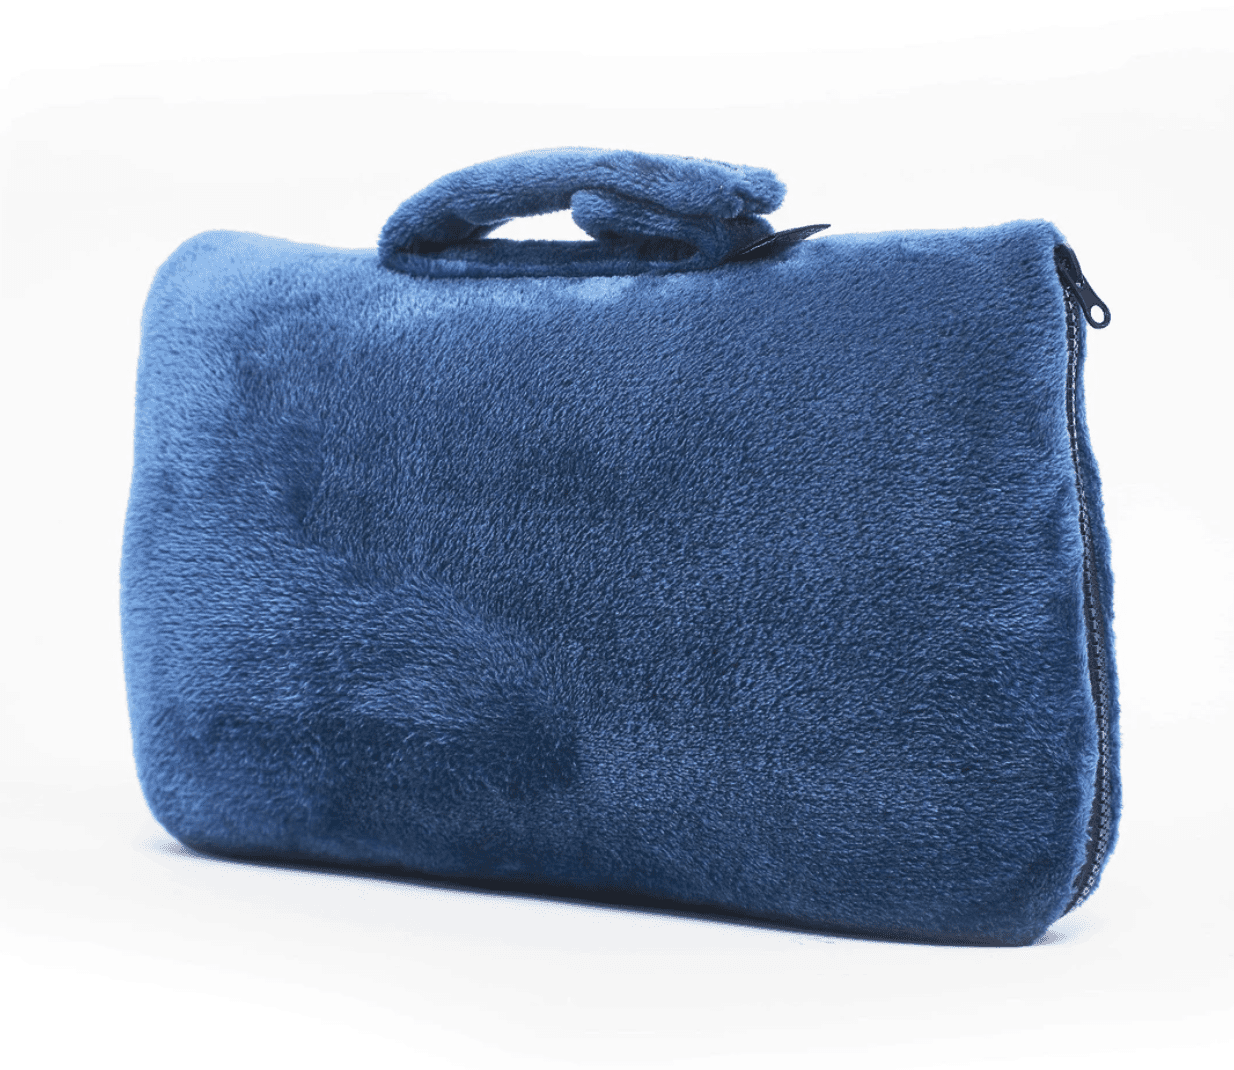 Cabeau Fold 'n Go Travel and Throw Blanket